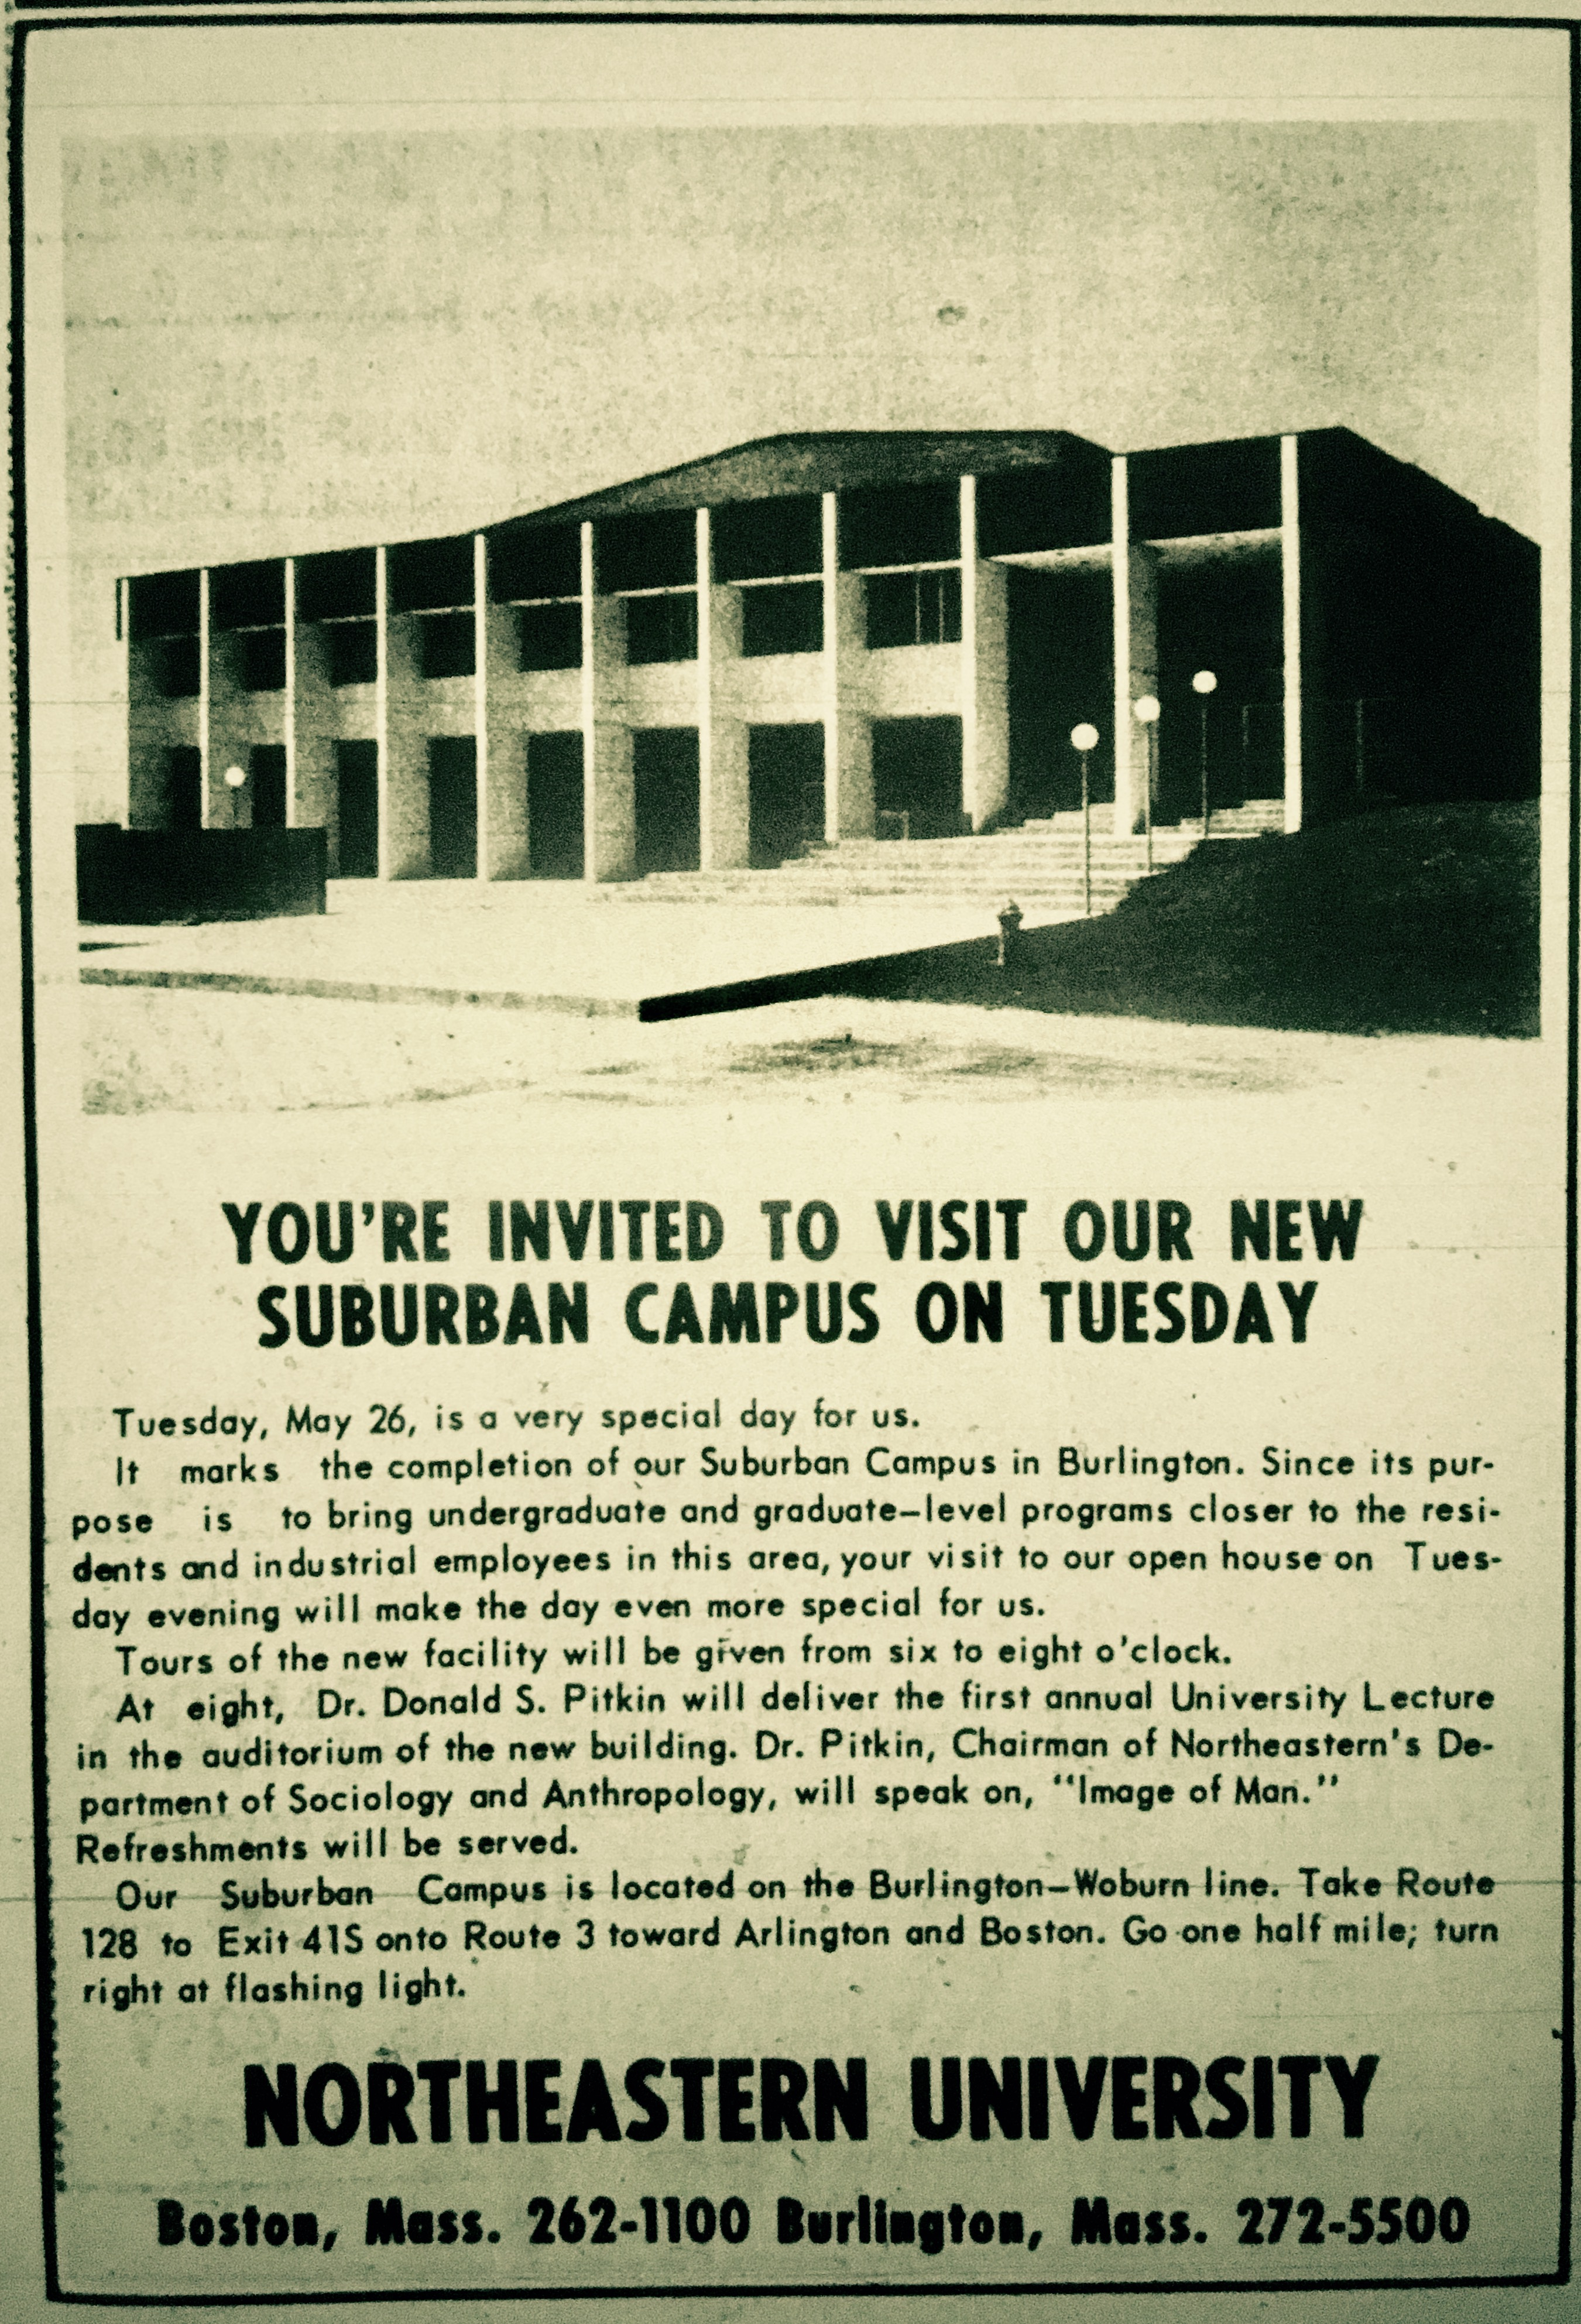 Northeastern University campus Burlington, MA